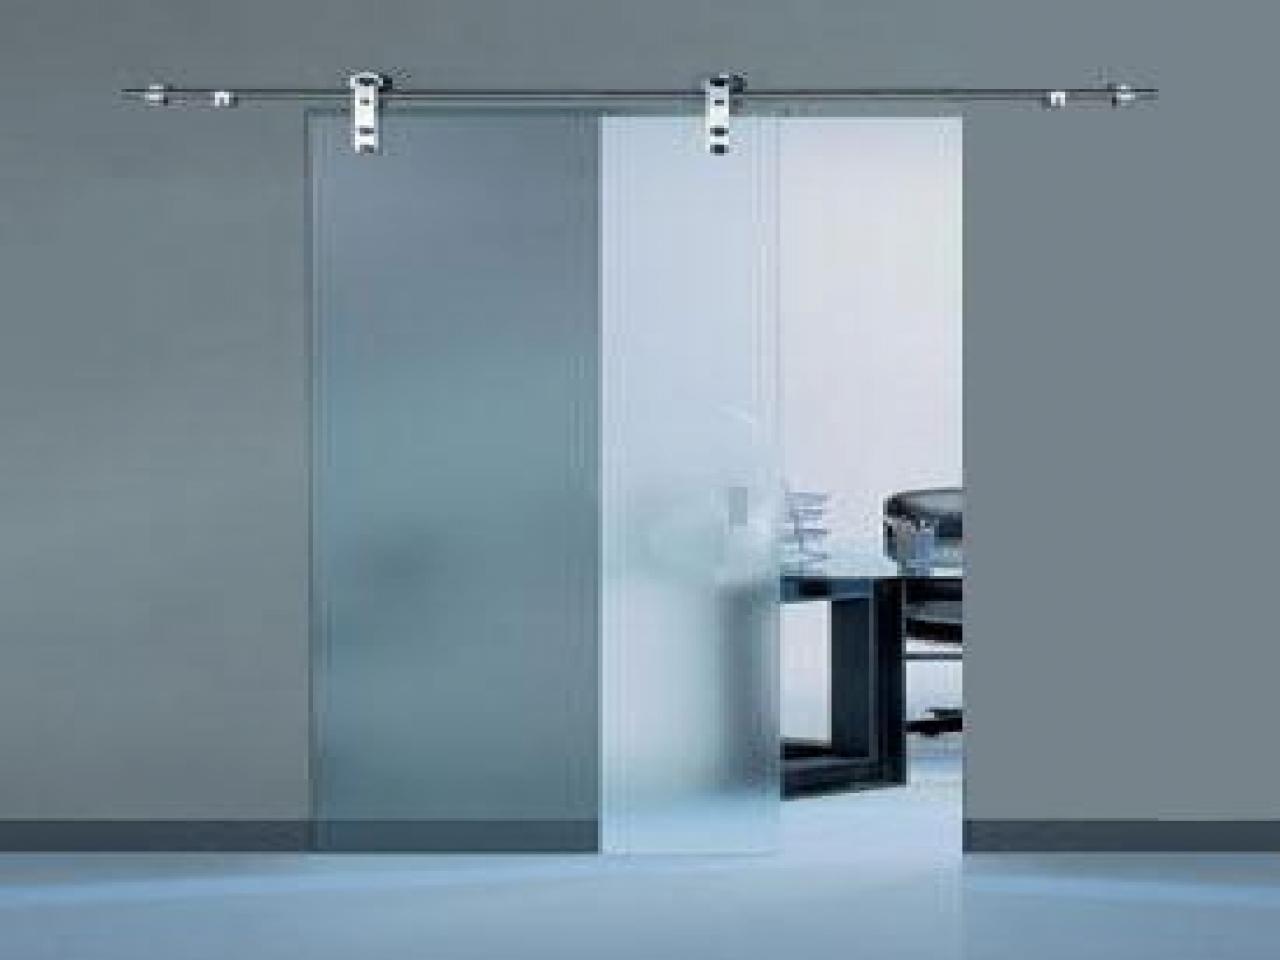 Wall Mounted Sliding Glass Doorswall mounted sliding door sliding glass door curtains sliding